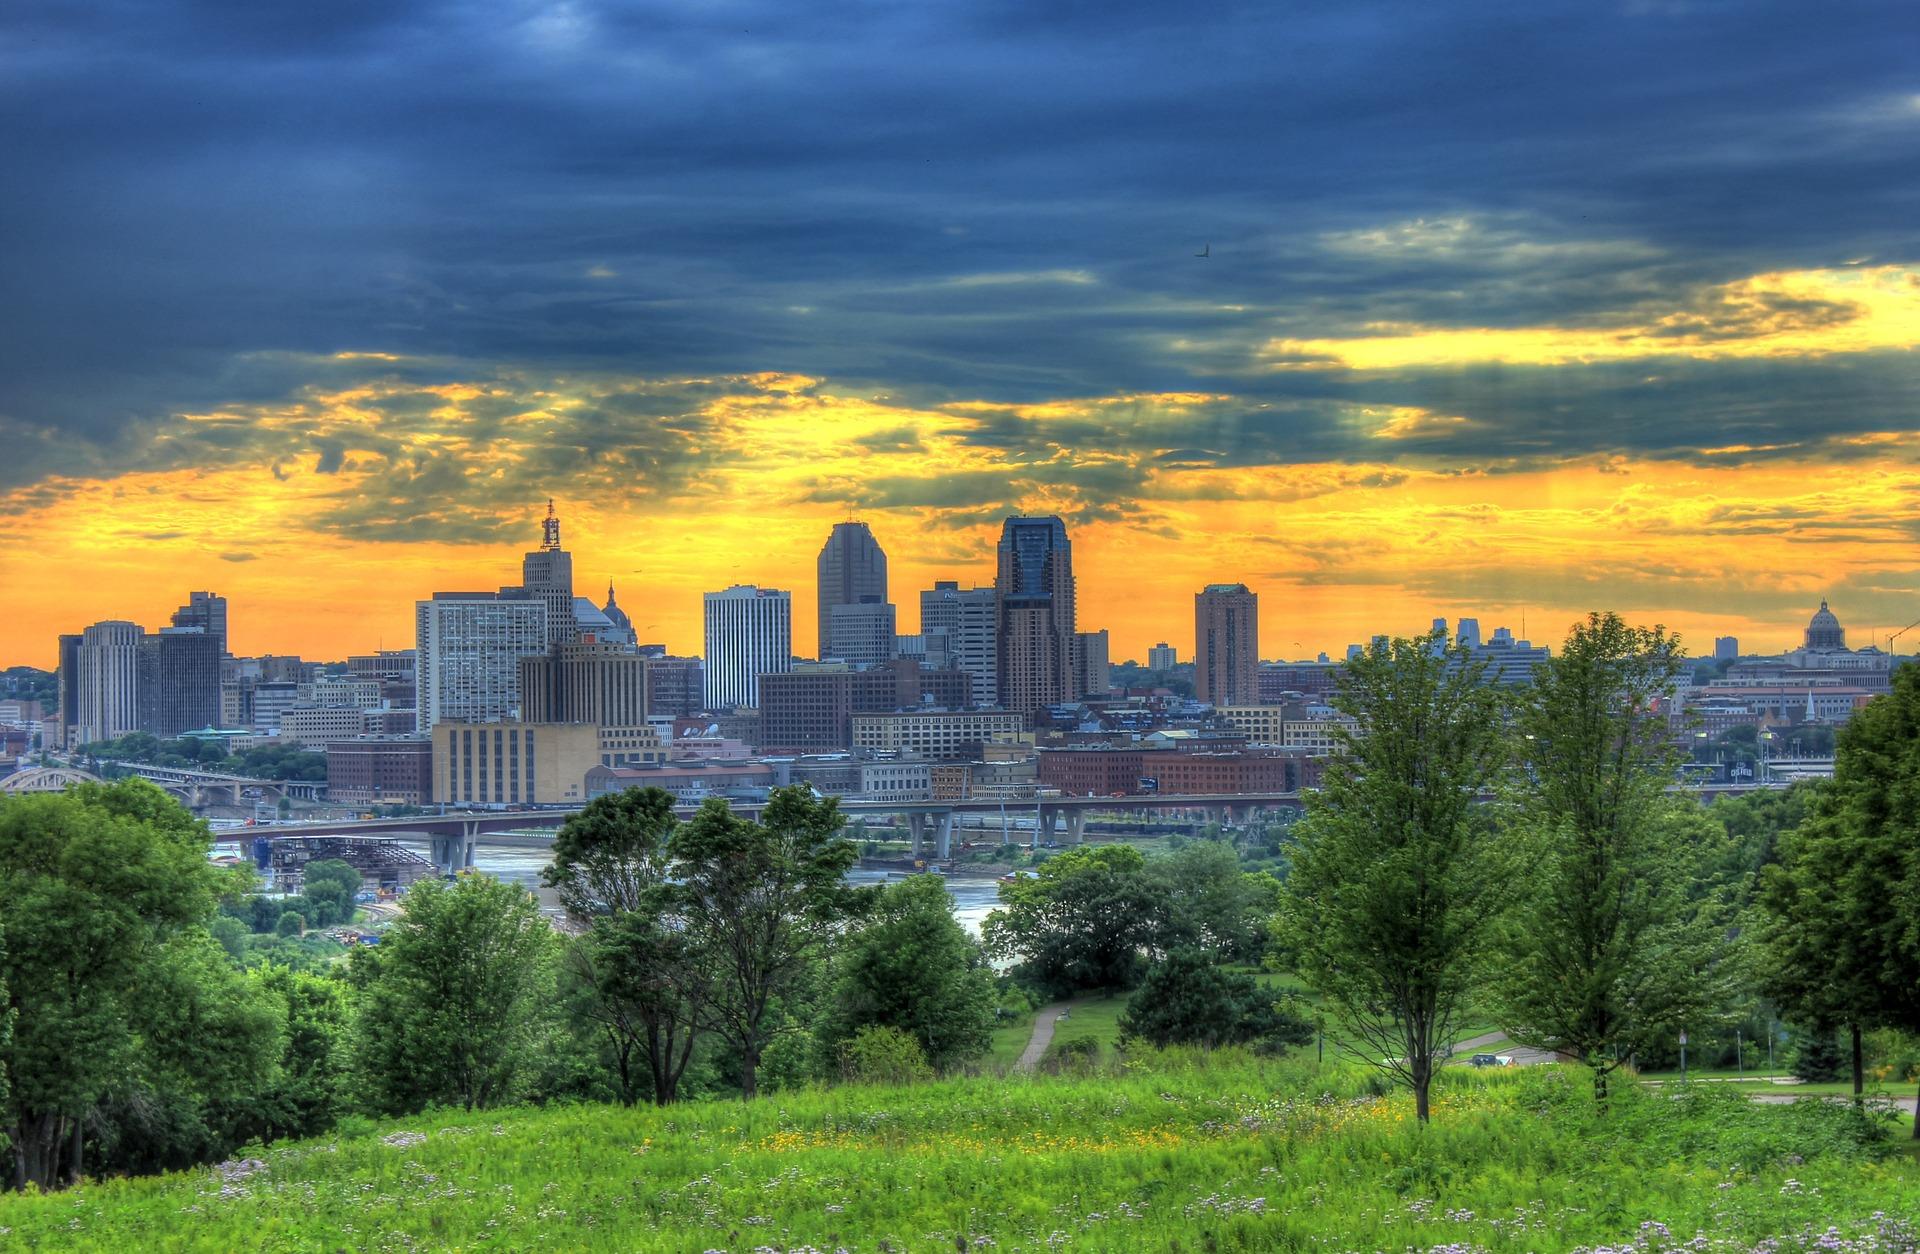 St. Paul city skyline from distant.